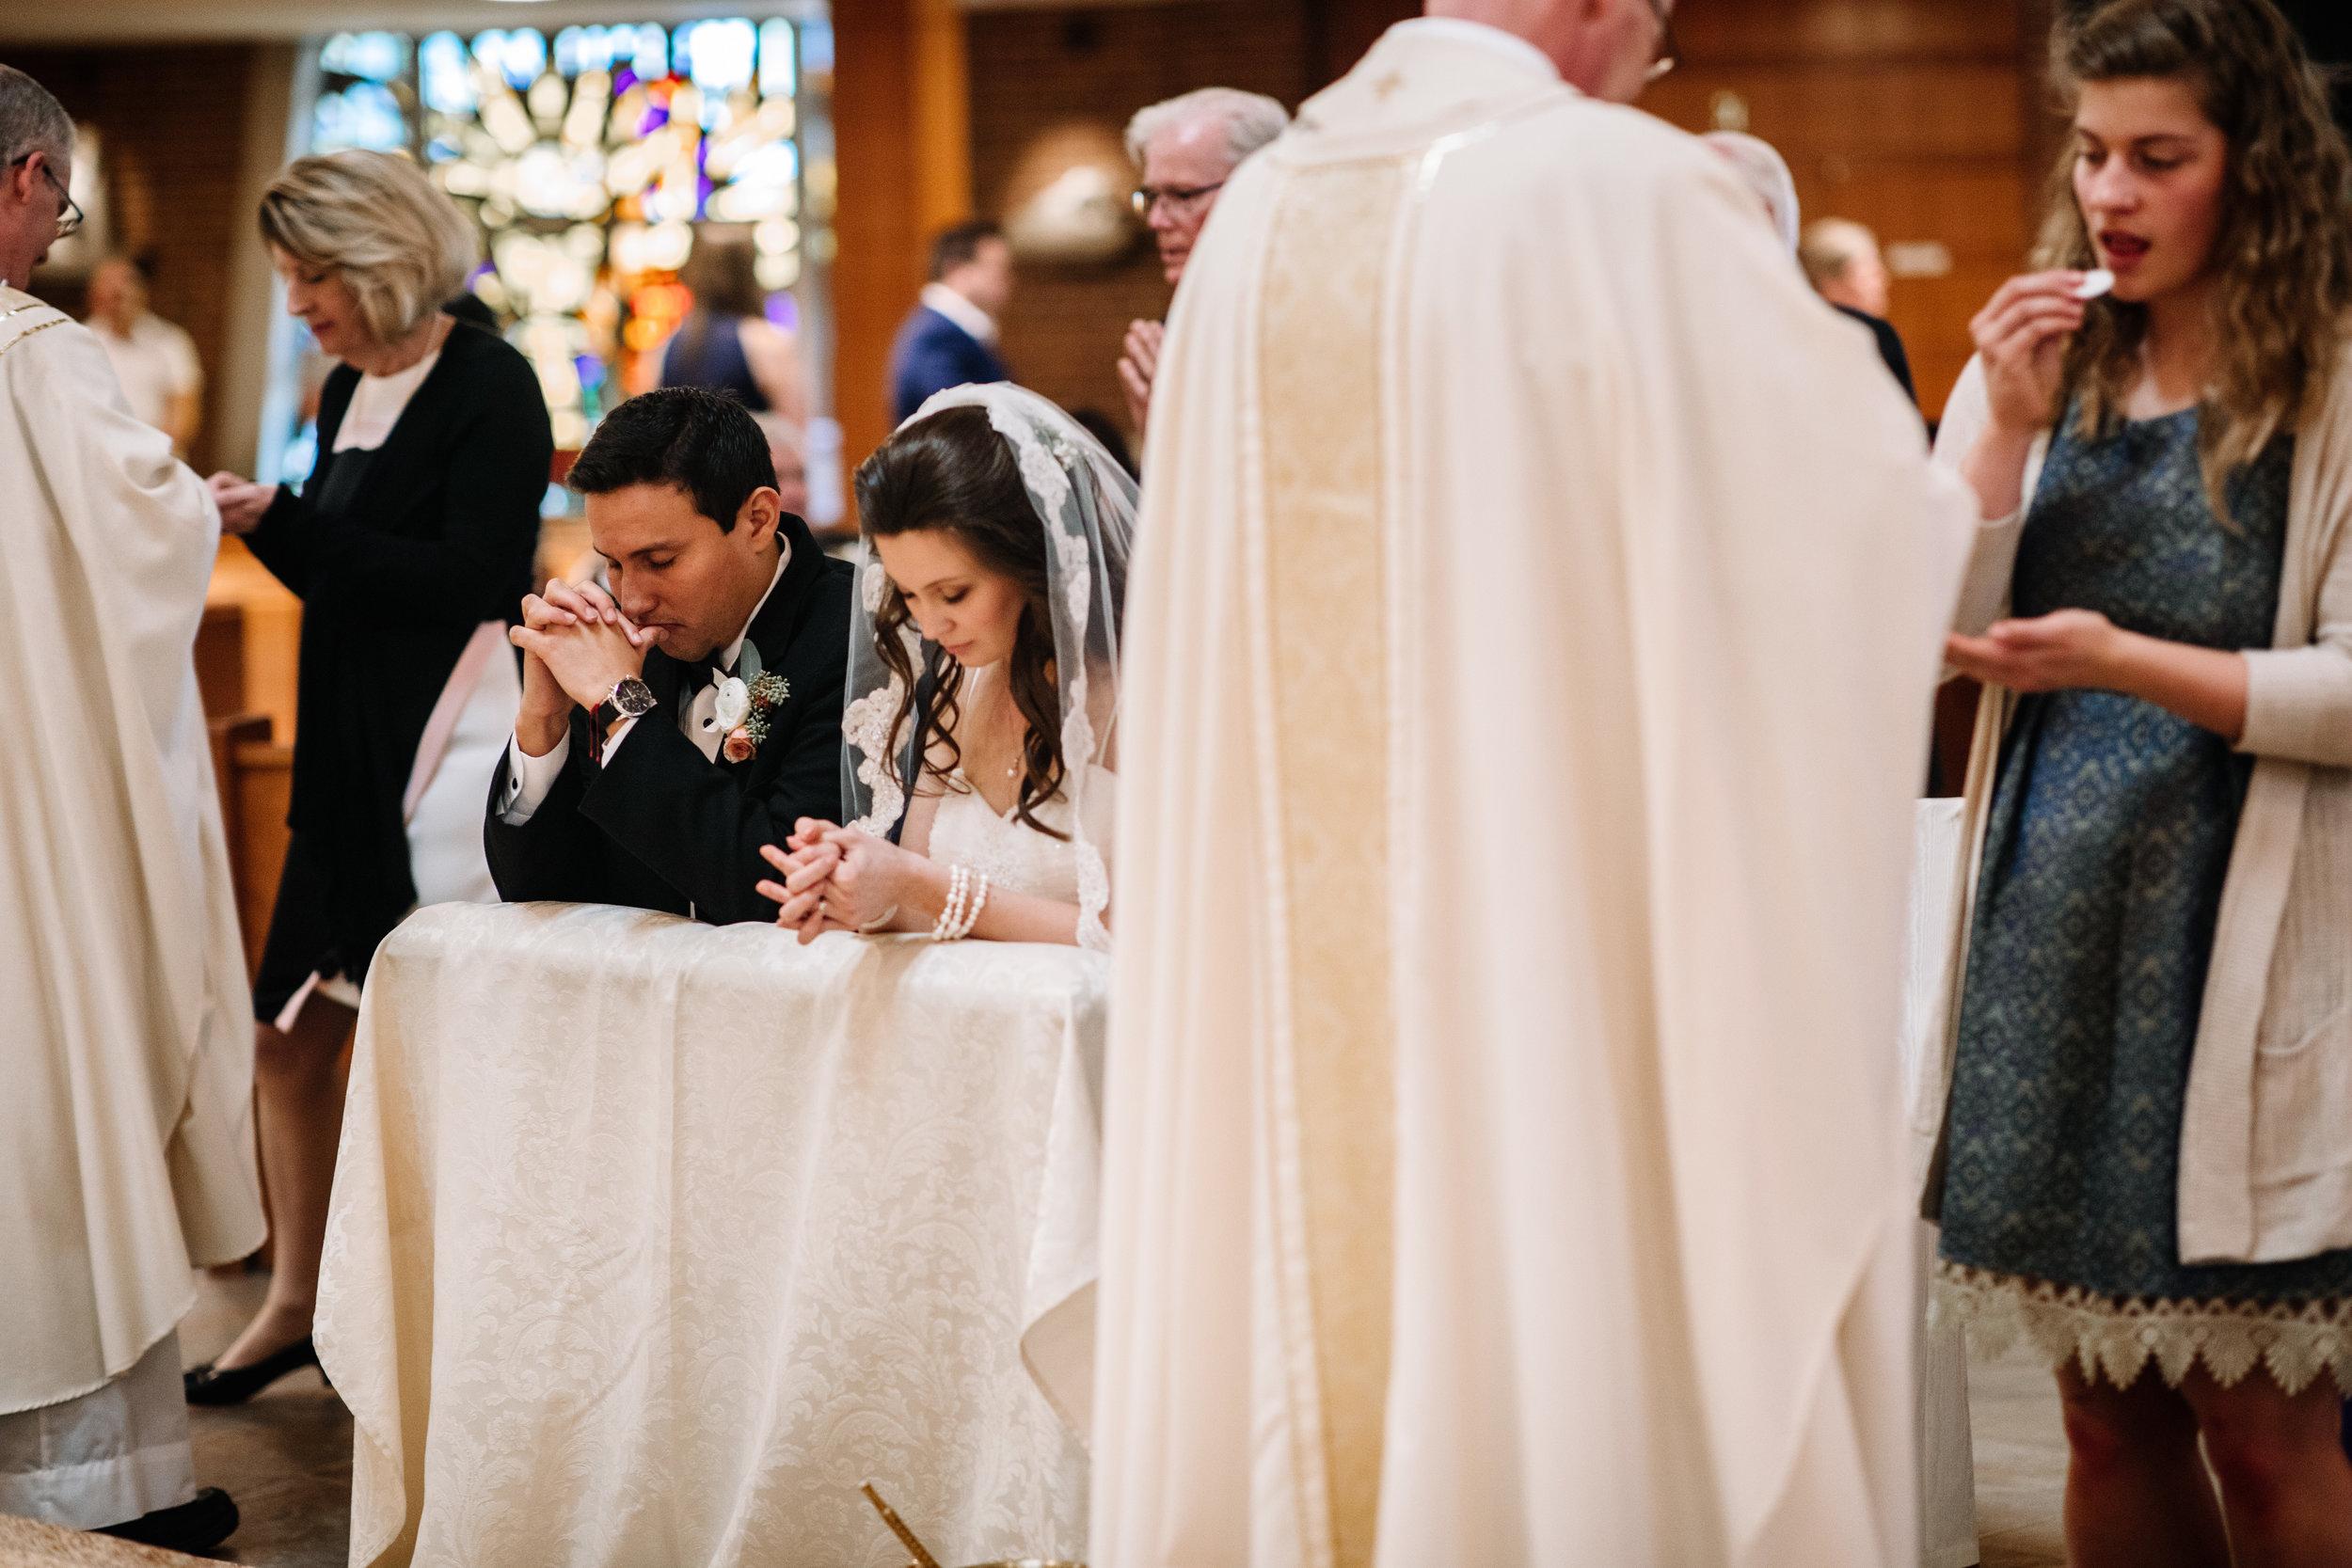 Groom and Bride kneeling Communion Wedding Mass St. Leo the Great Church Fairfax